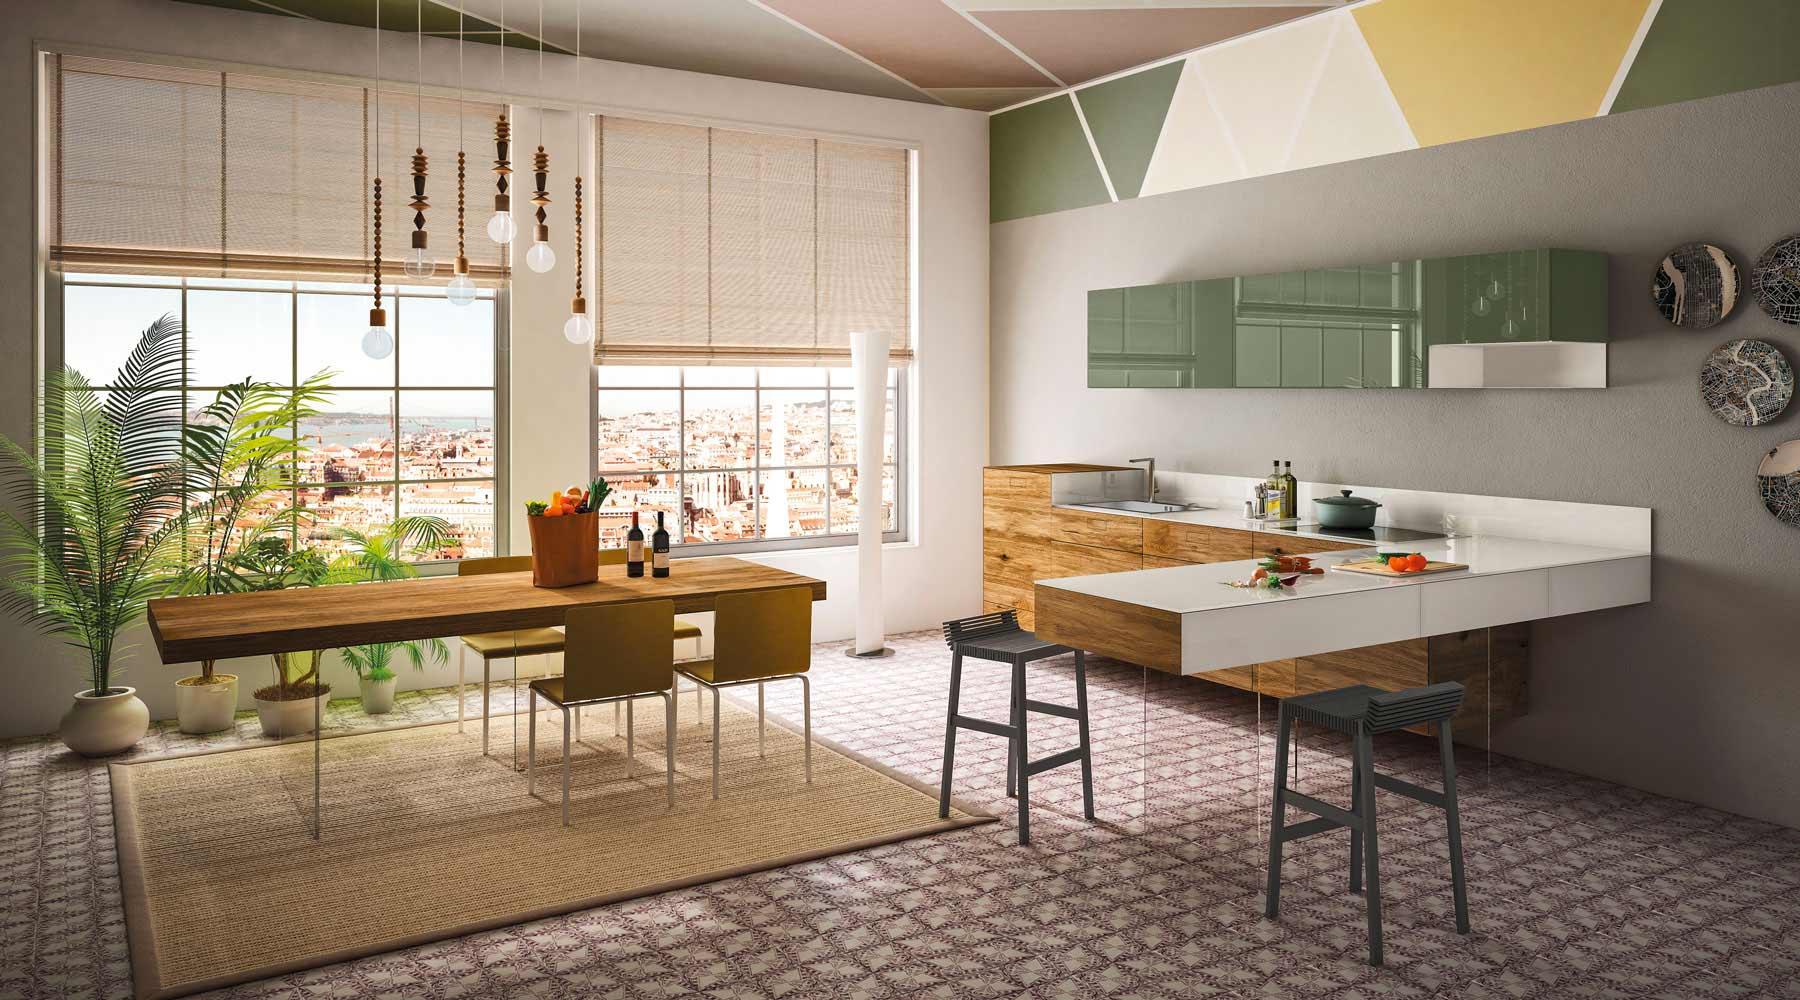 Cucina Wildwood Curiosity Strippoli Mobili Corato Home Design